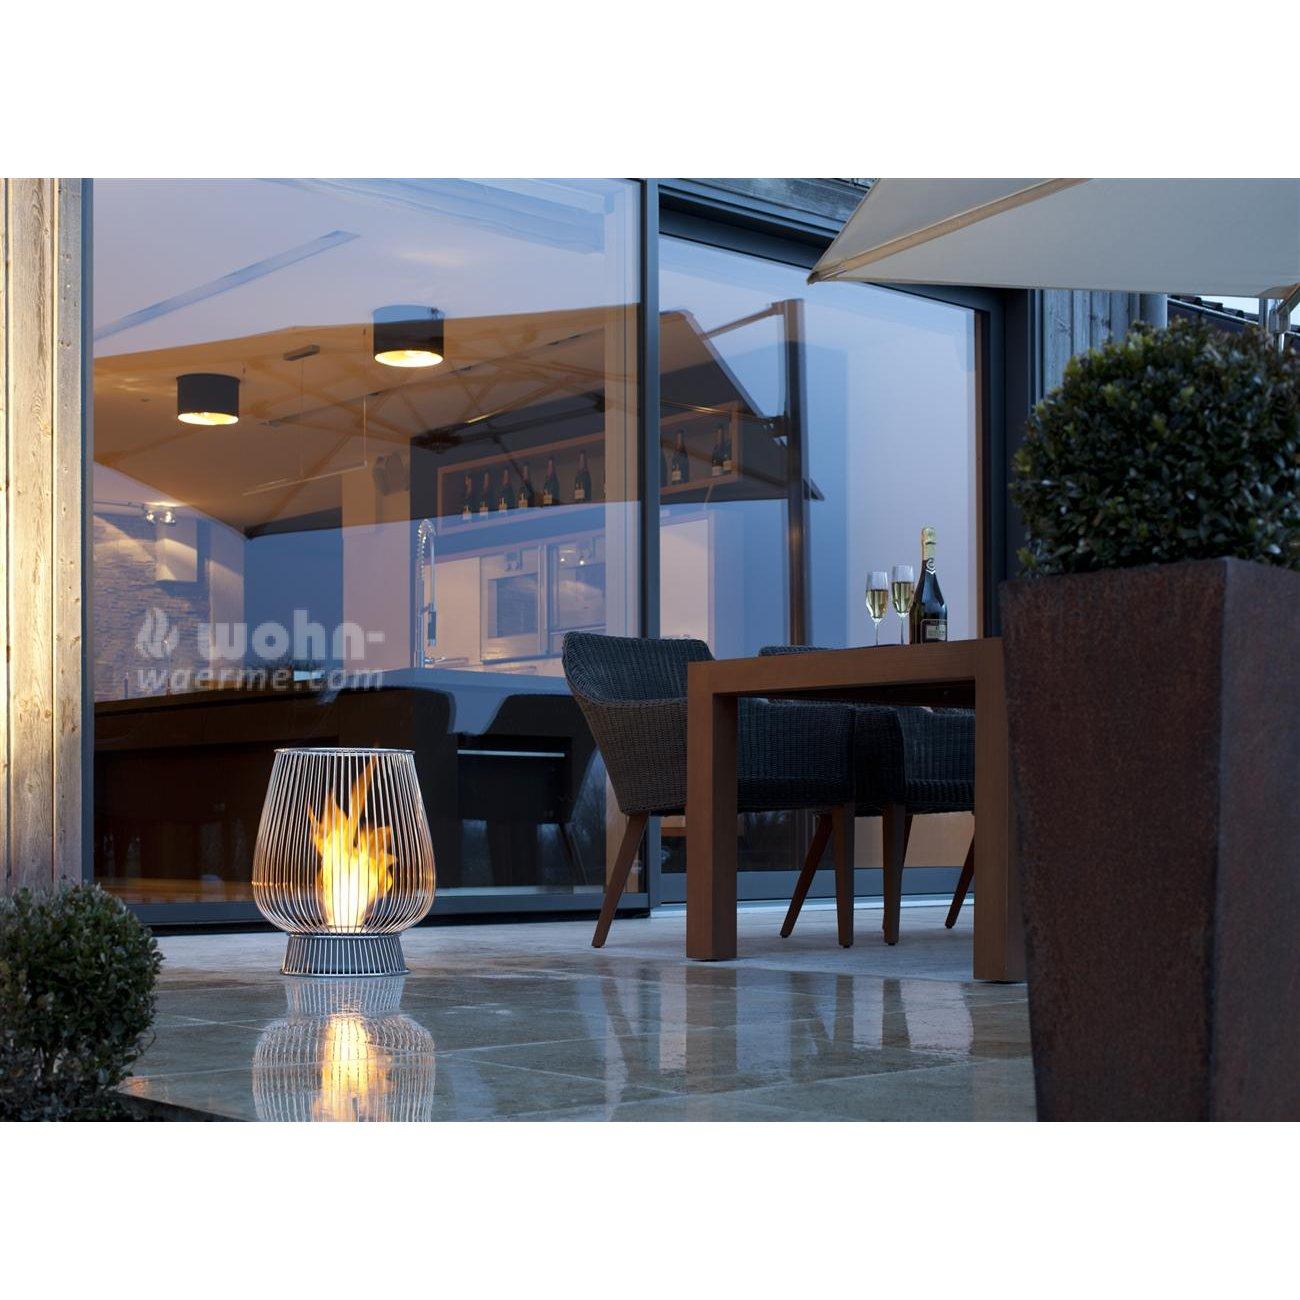 garten ethanol kamin ecosmart bulb. Black Bedroom Furniture Sets. Home Design Ideas